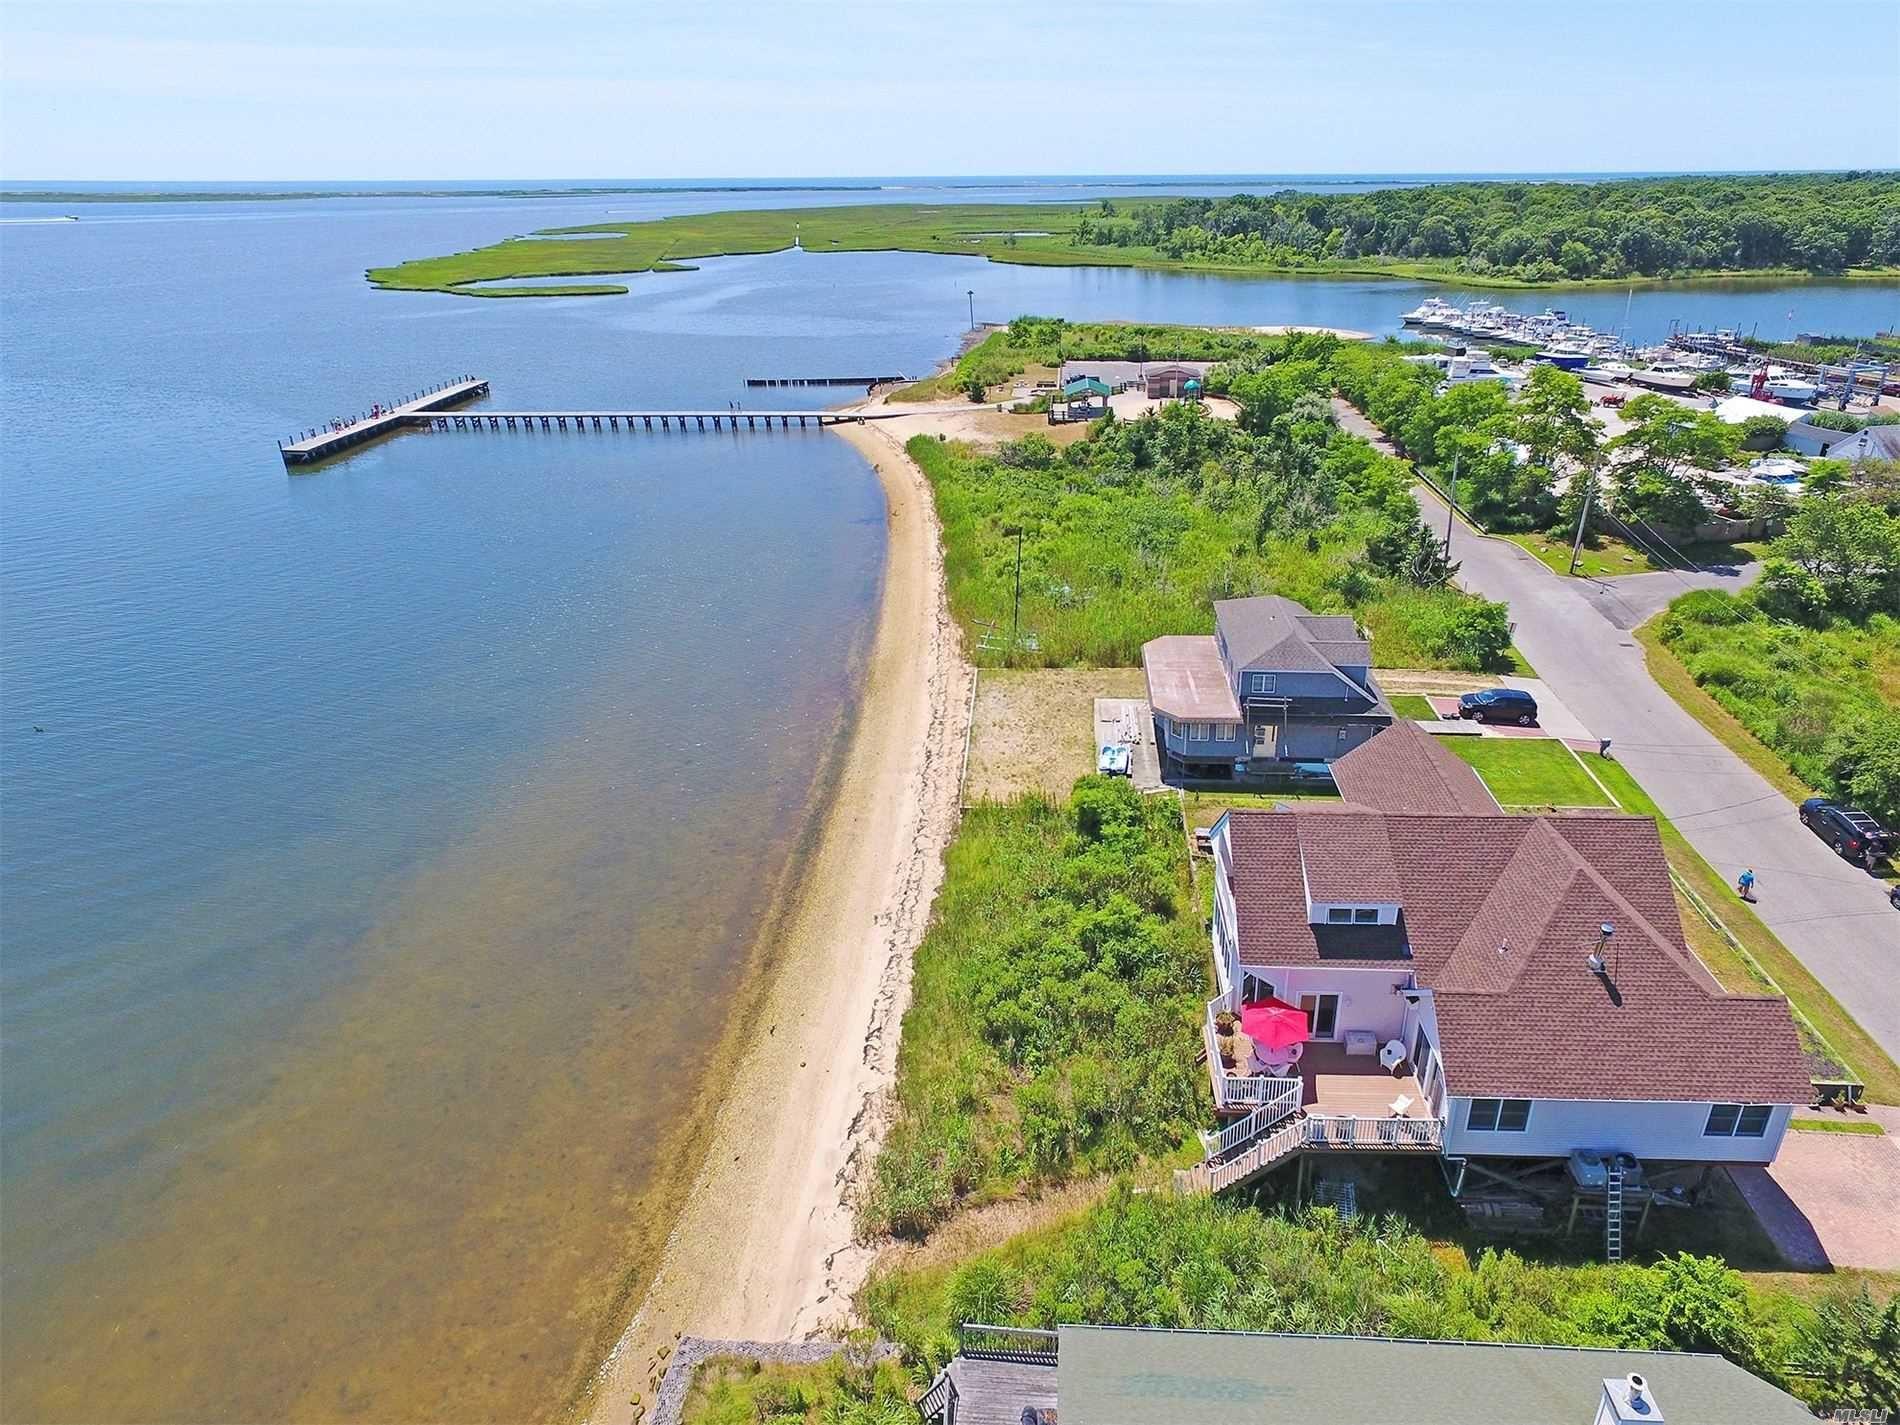 23 Oceanview Drive, Mastic Beach, NY 11951 - MLS#: 3208753